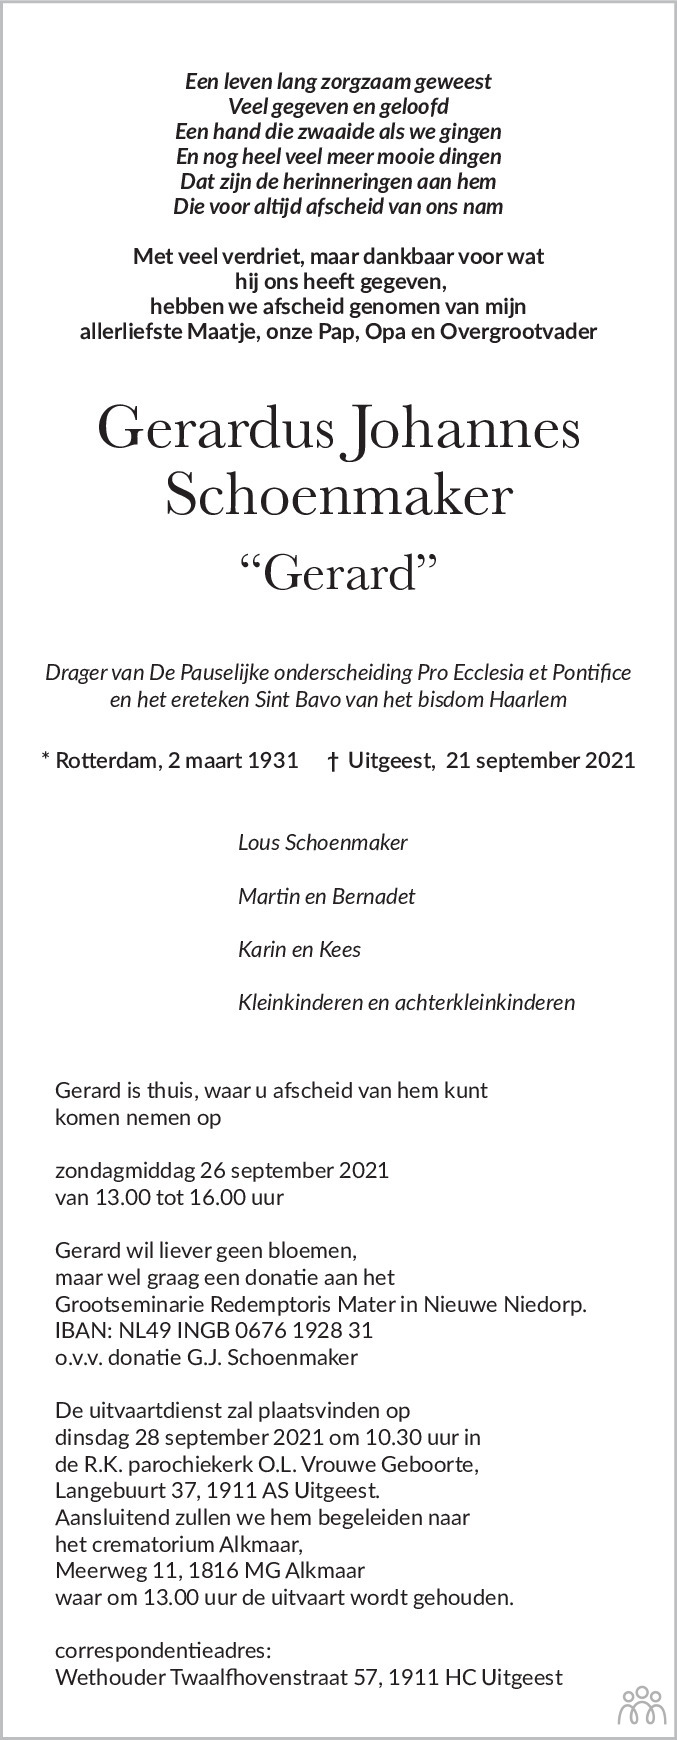 Overlijdensbericht van Gerardus Johannes (Gerard) Schoenmaker in Dagblad Kennemerland